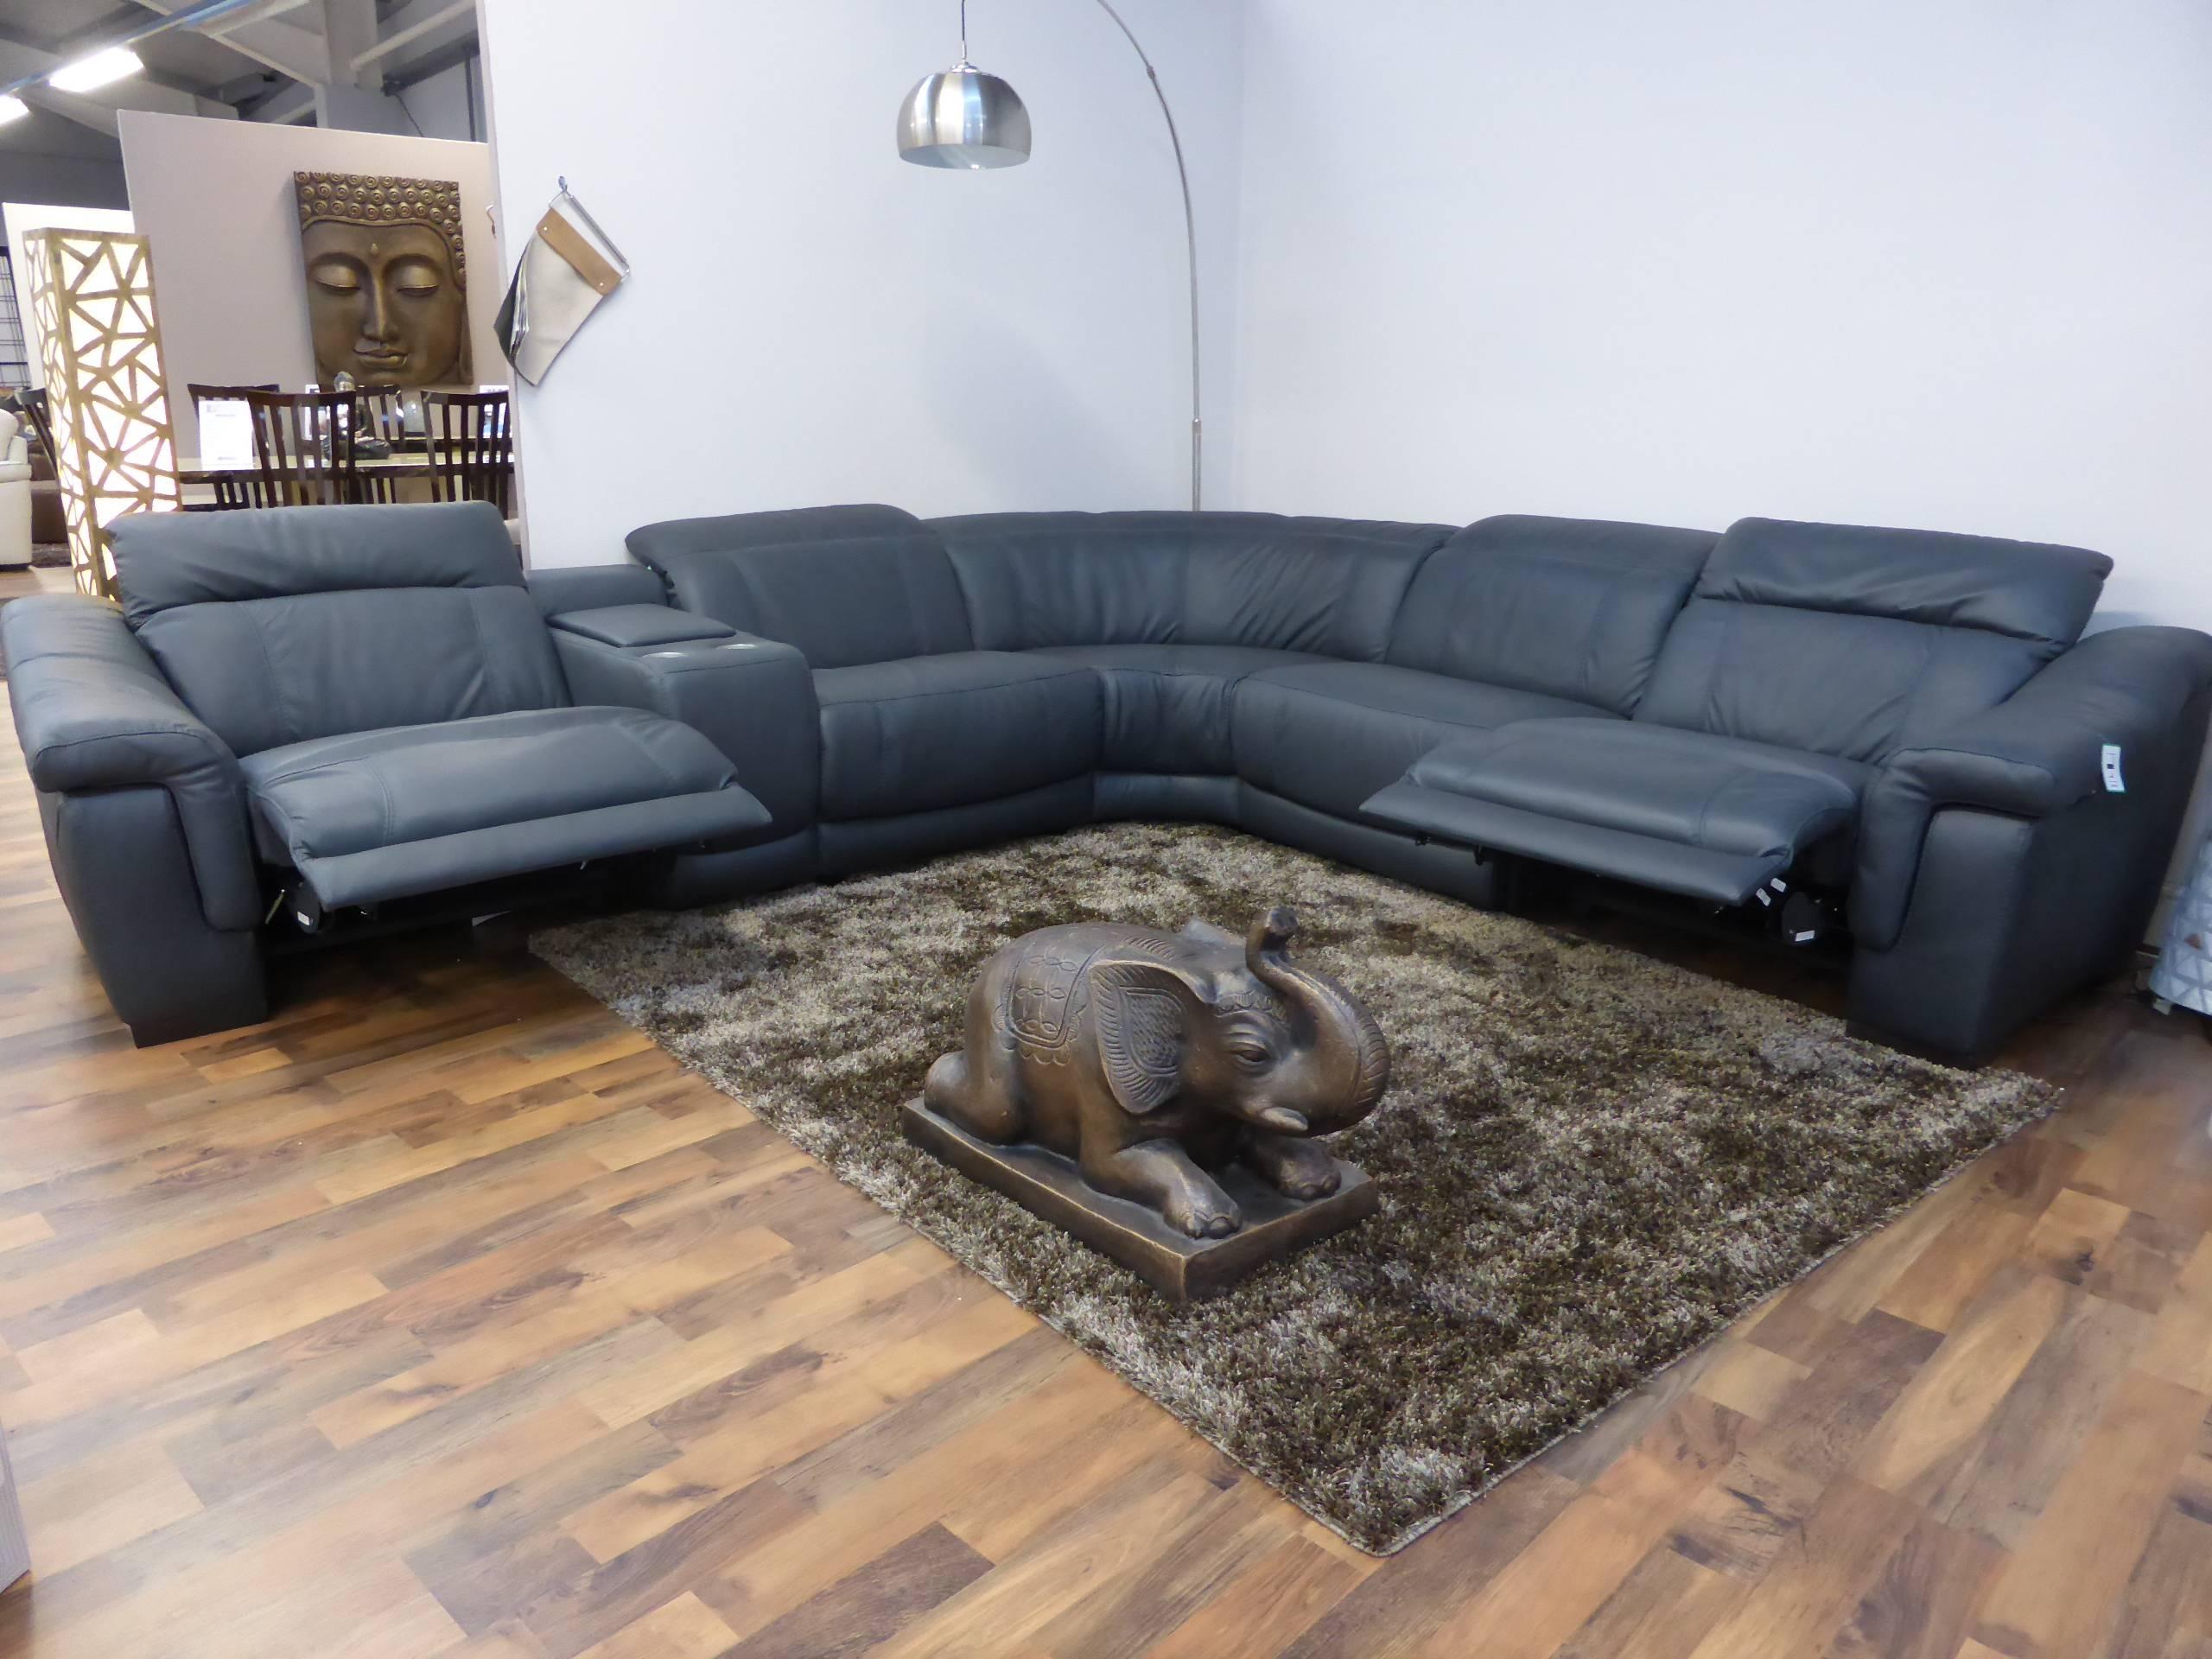 Corner Recliner Sofa Fabric - Fjellkjeden in Italian Recliner Sofas (Image 7 of 15)